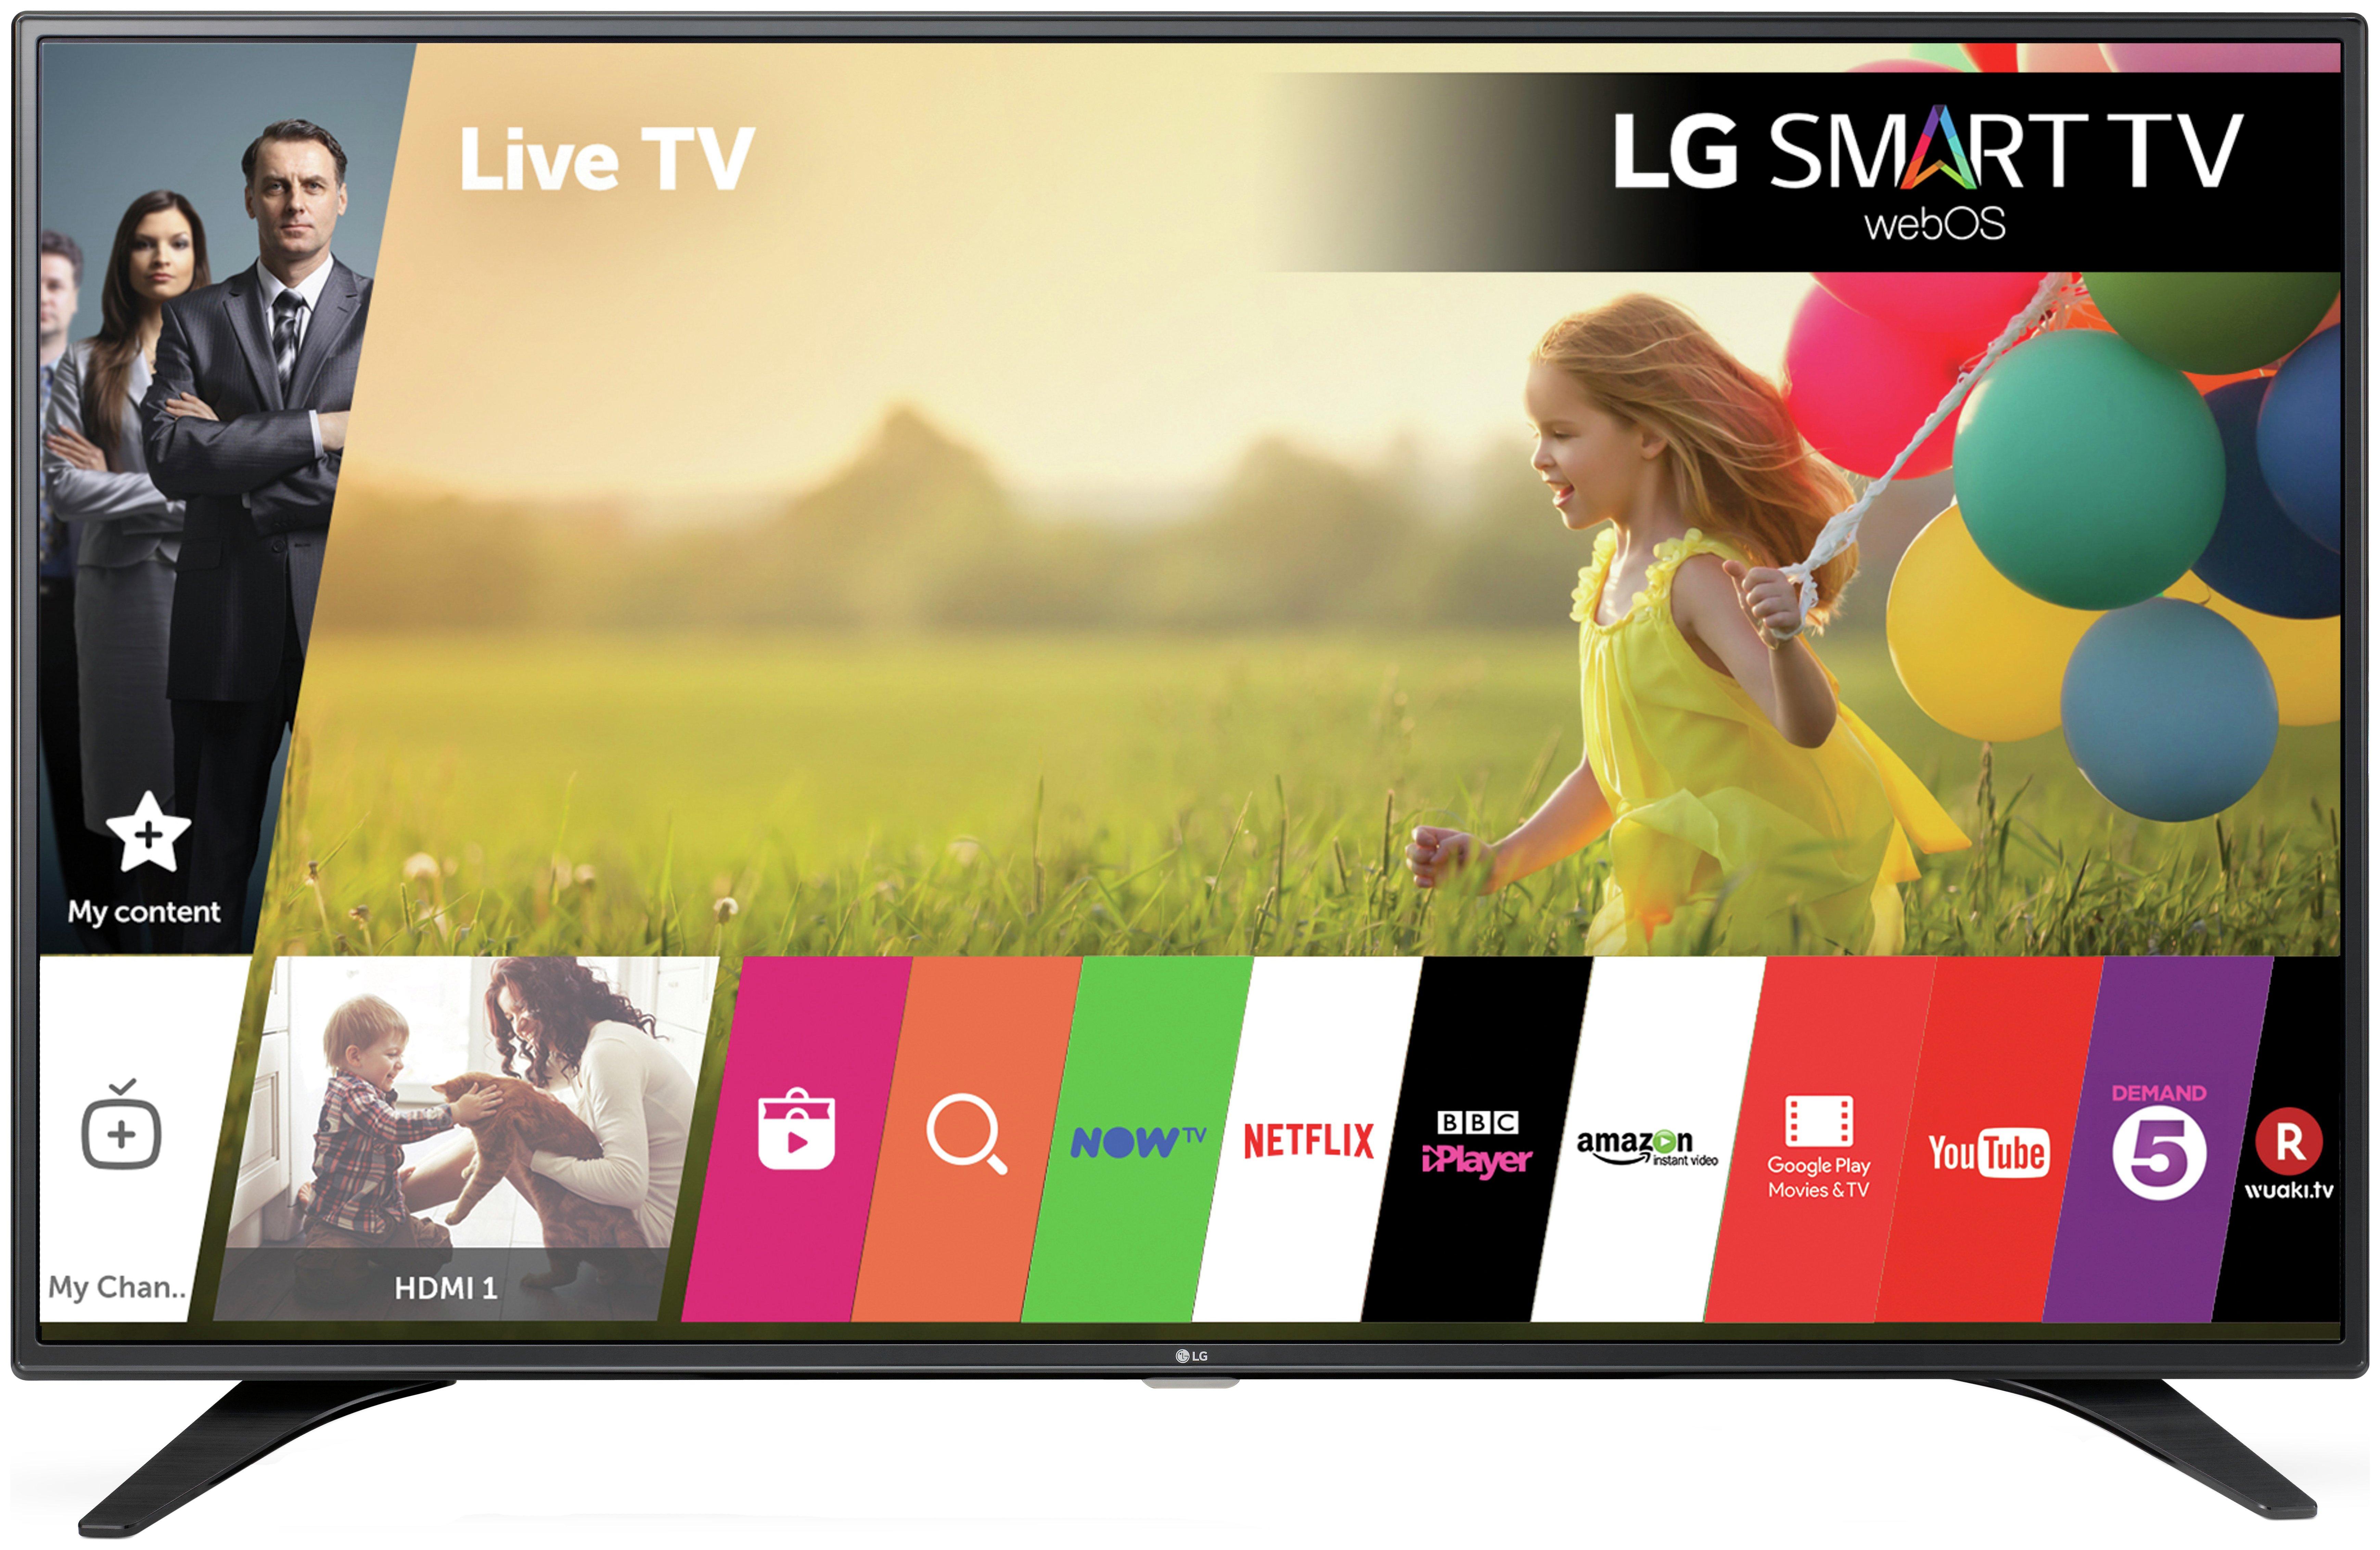 Image of LG - 32 Inch - 32LH604V - Full HD Web OS - Smart LED TV.